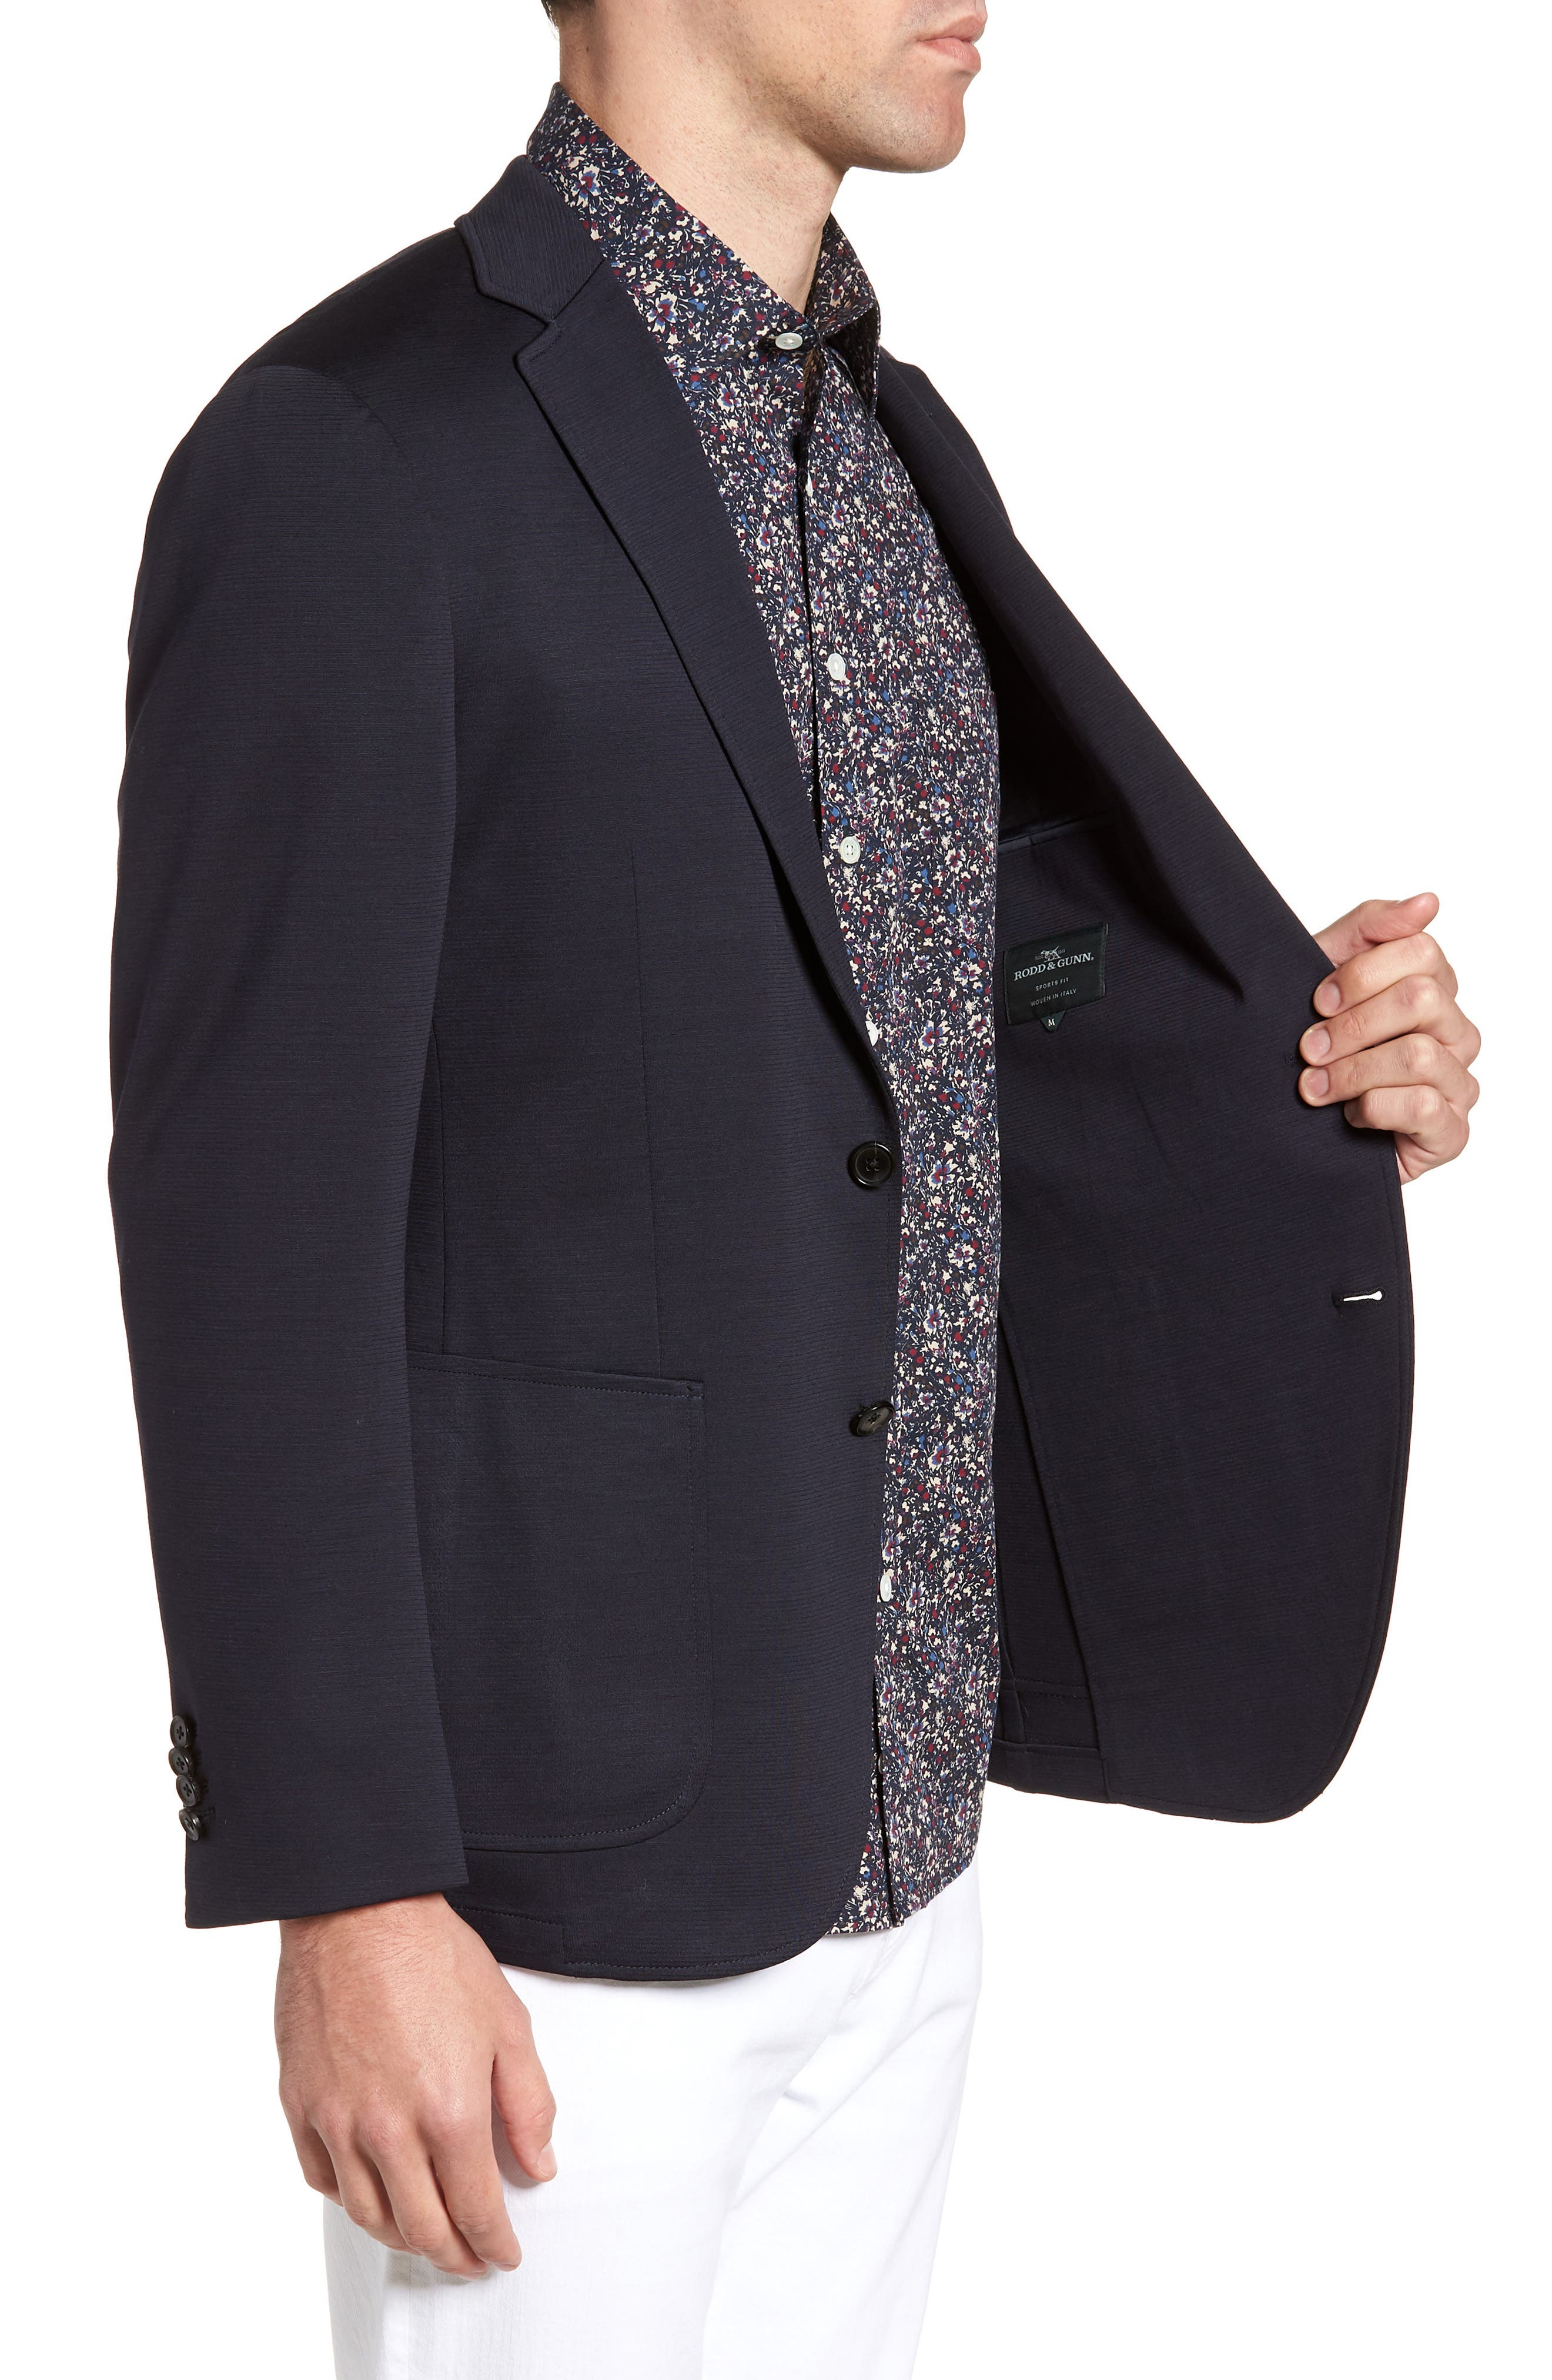 Cardrona Slim Fit Wool Blend Blazer,                             Alternate thumbnail 3, color,                             Navy